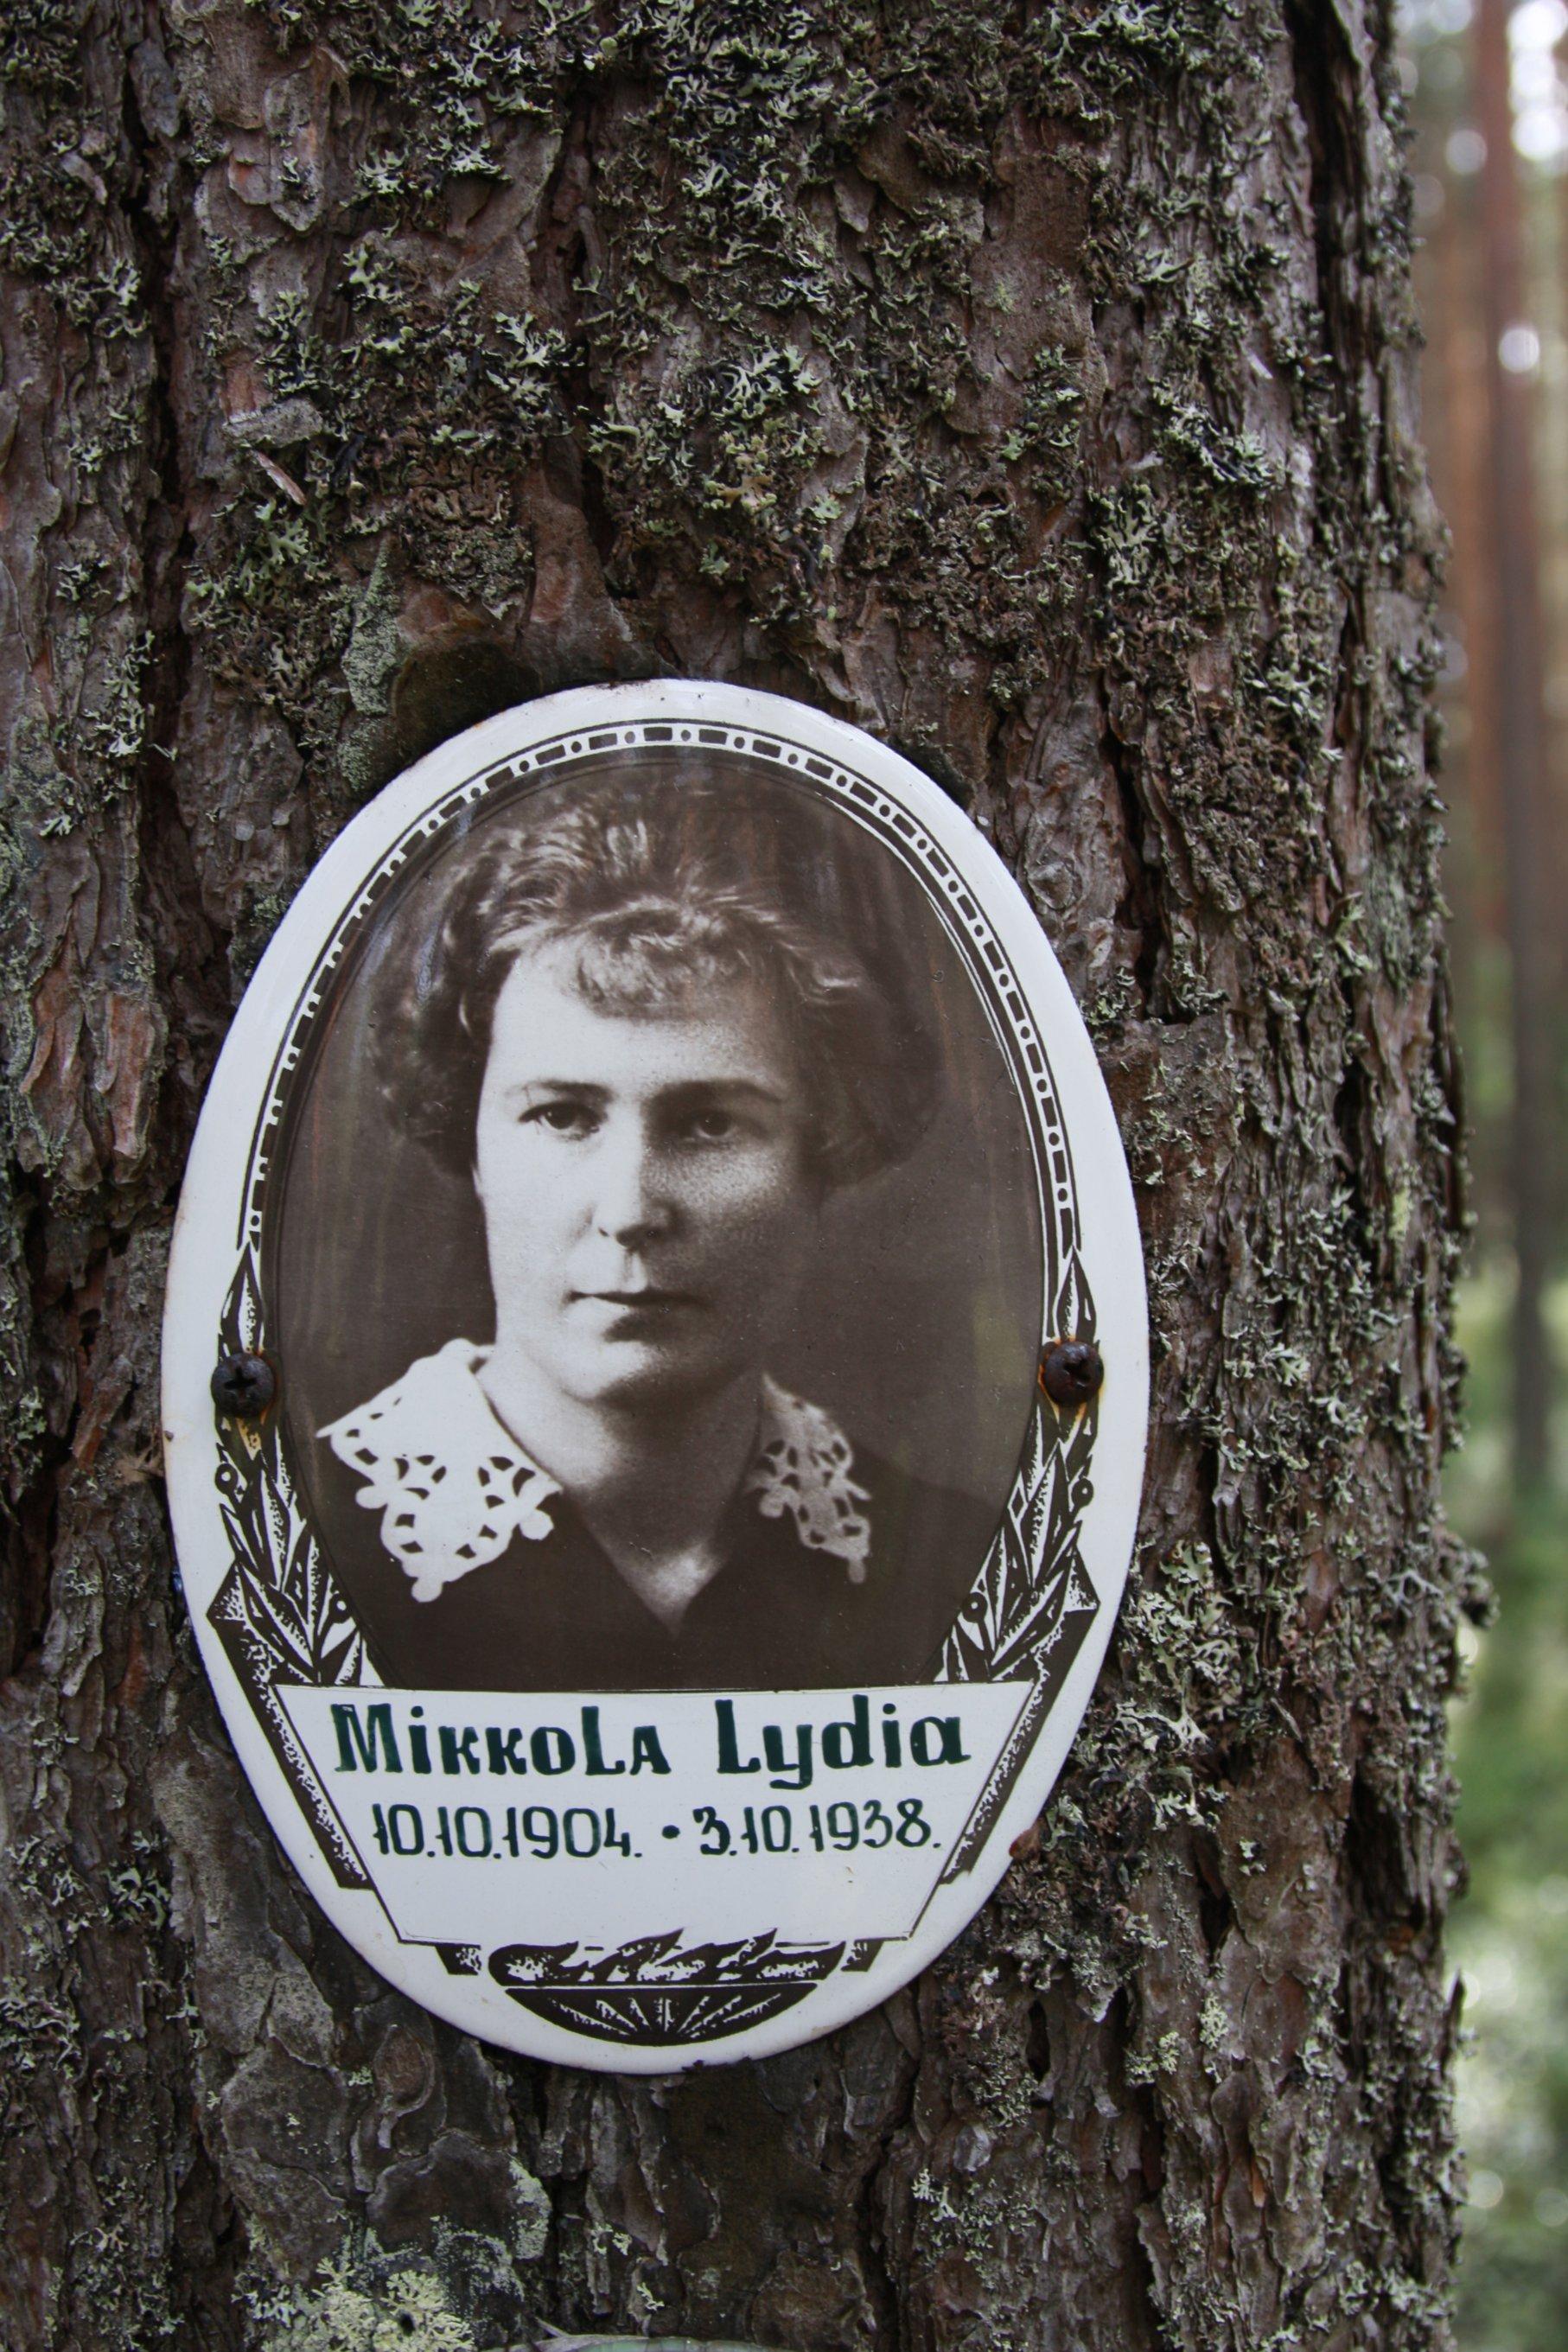 Памятная табличка «Mikkola Lydia». Фото 04.08.2018.